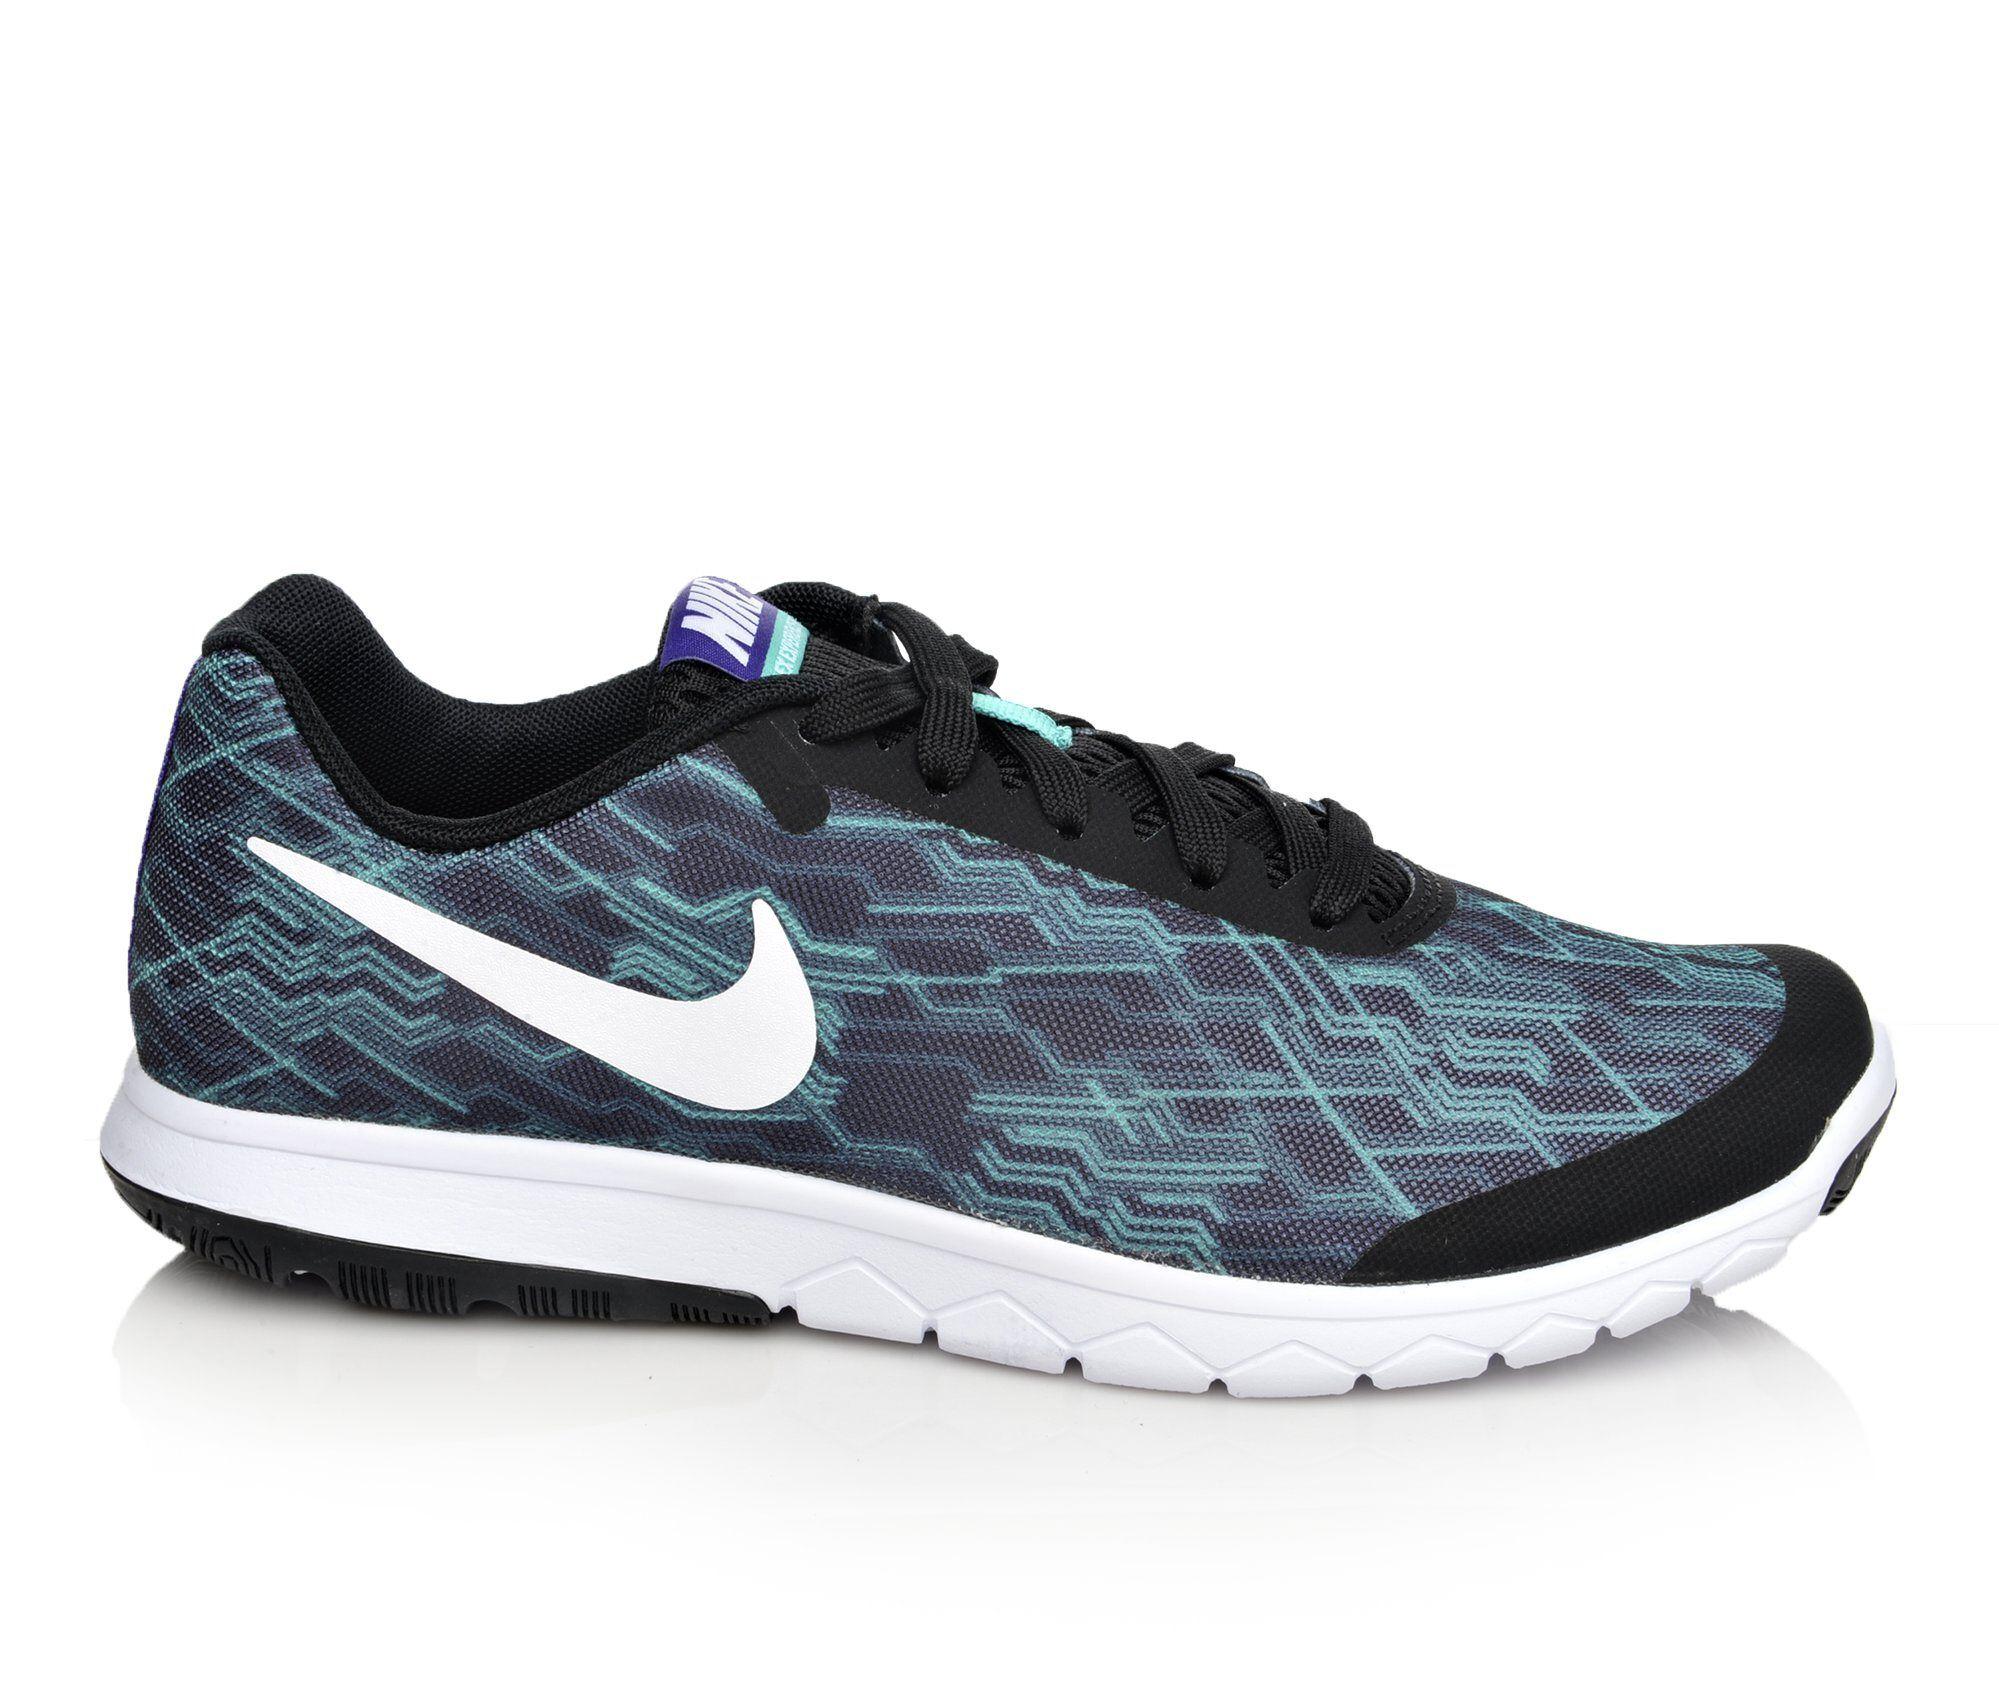 Women's Nike Flex Experience Run 5 Premium Running Shoes